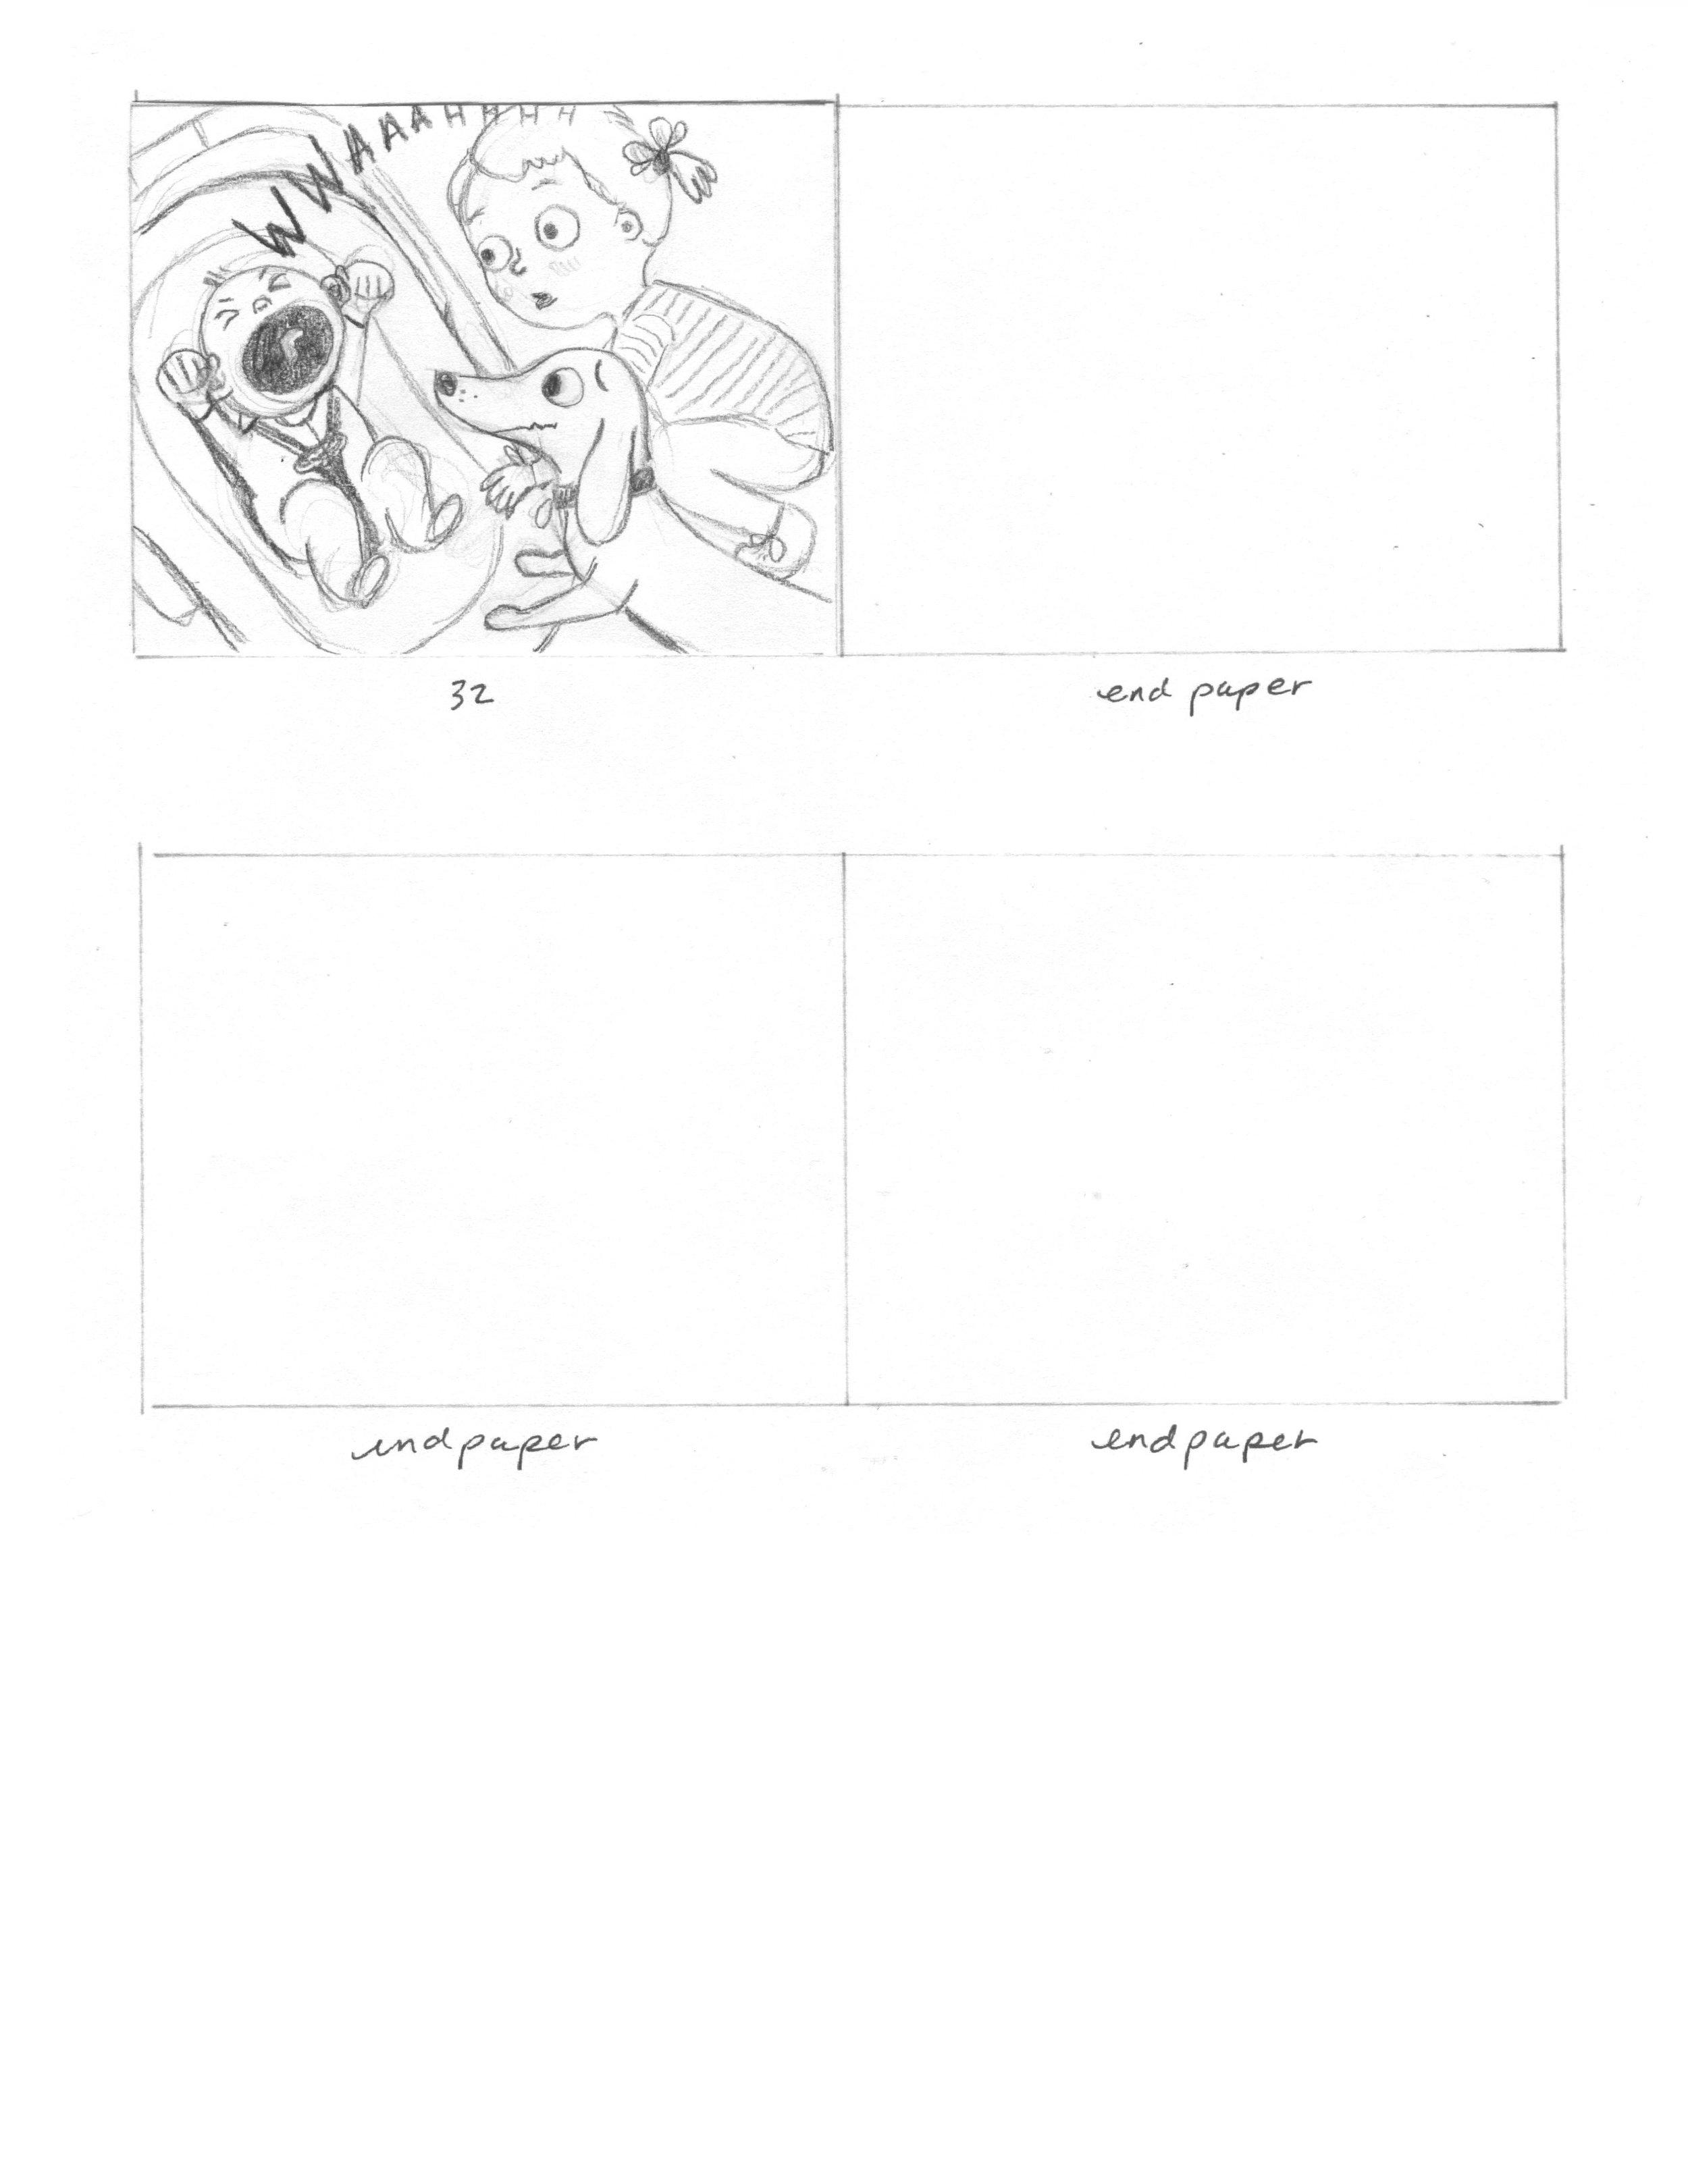 Storyboard p32.jpg